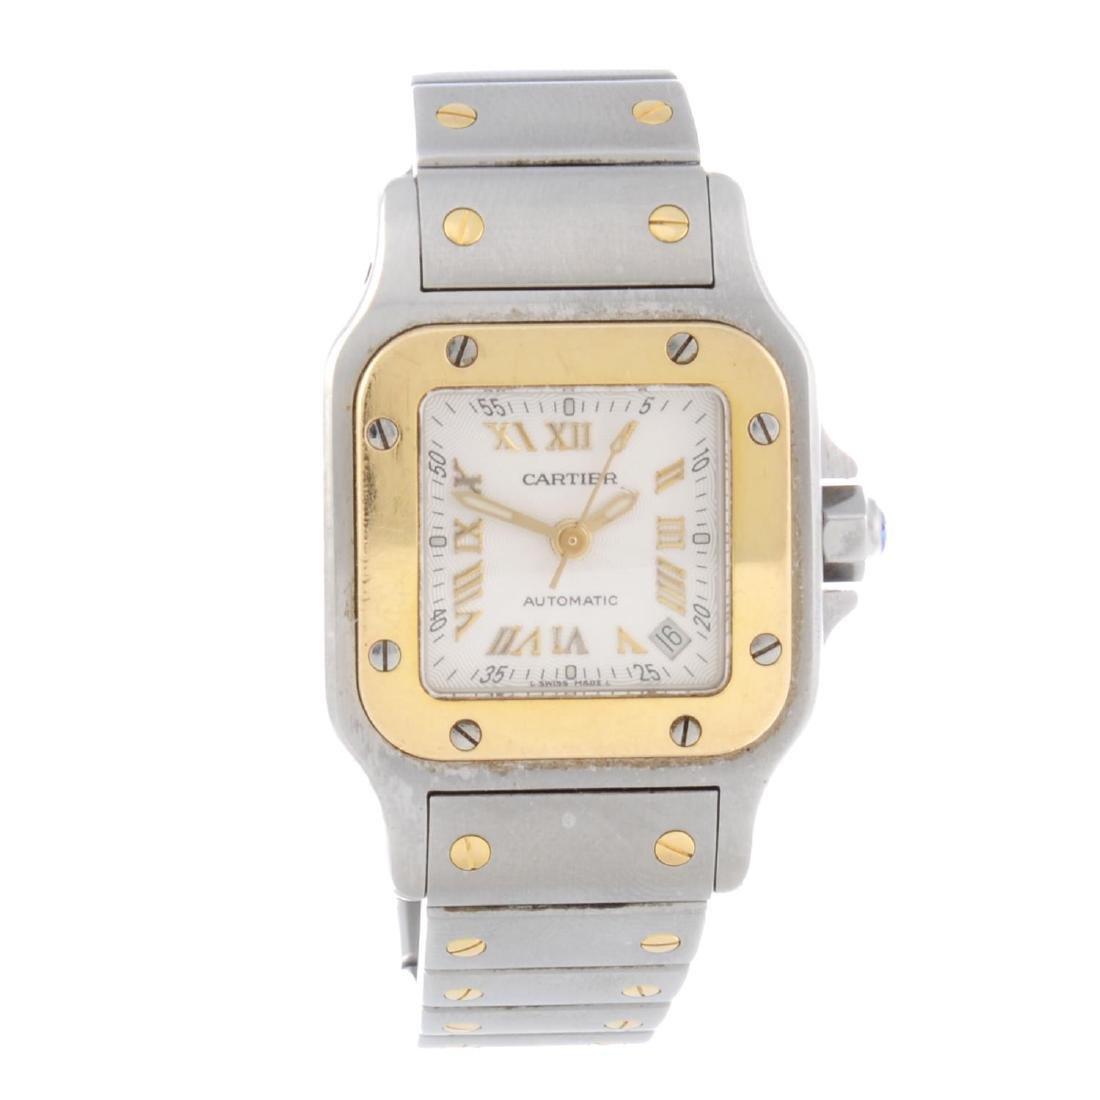 CARTIER - a Santos bracelet watch. Stainless steel case